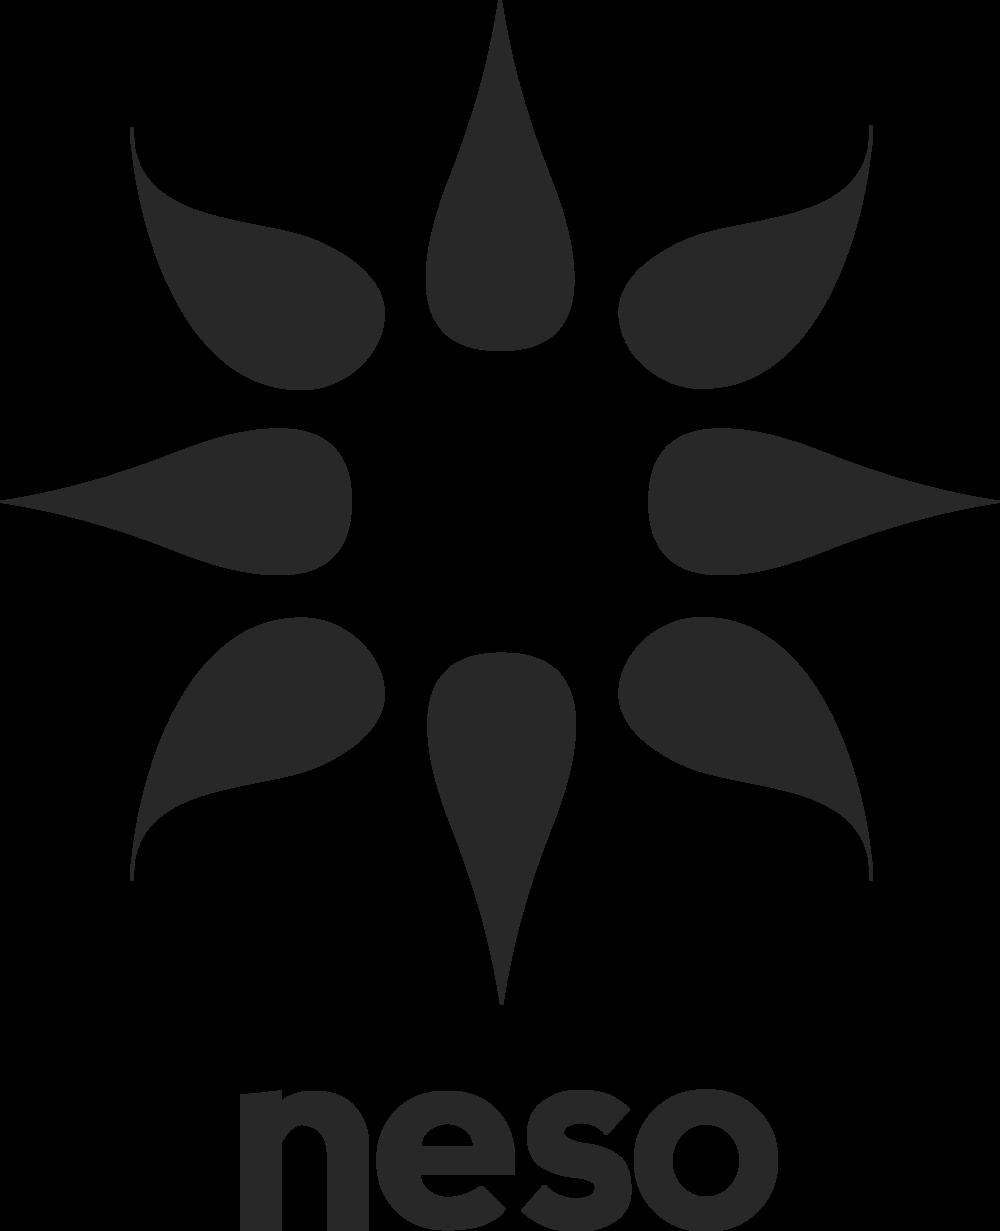 neso-logo.png